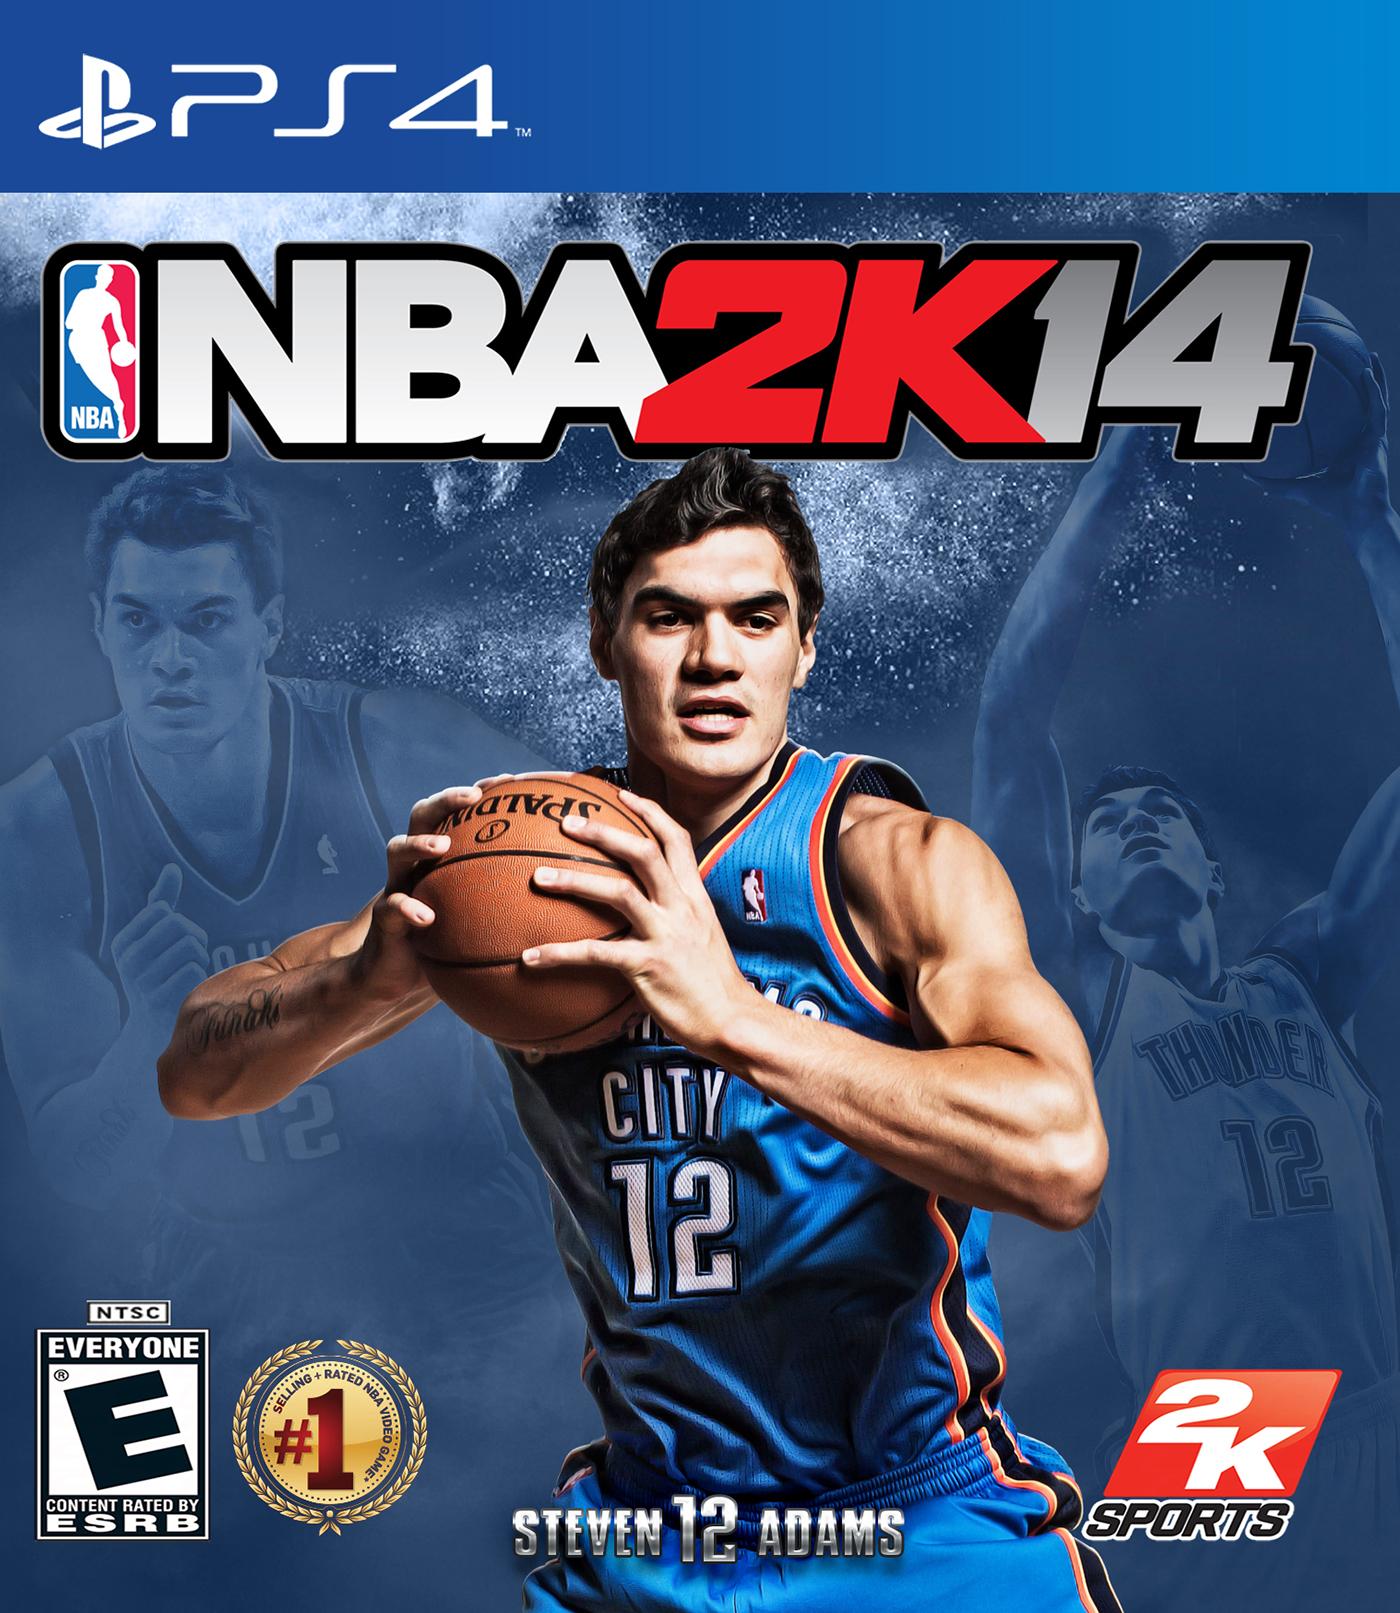 Nba 2k 20 Wallpaper: NBA 2K14: Steven Adams On Behance